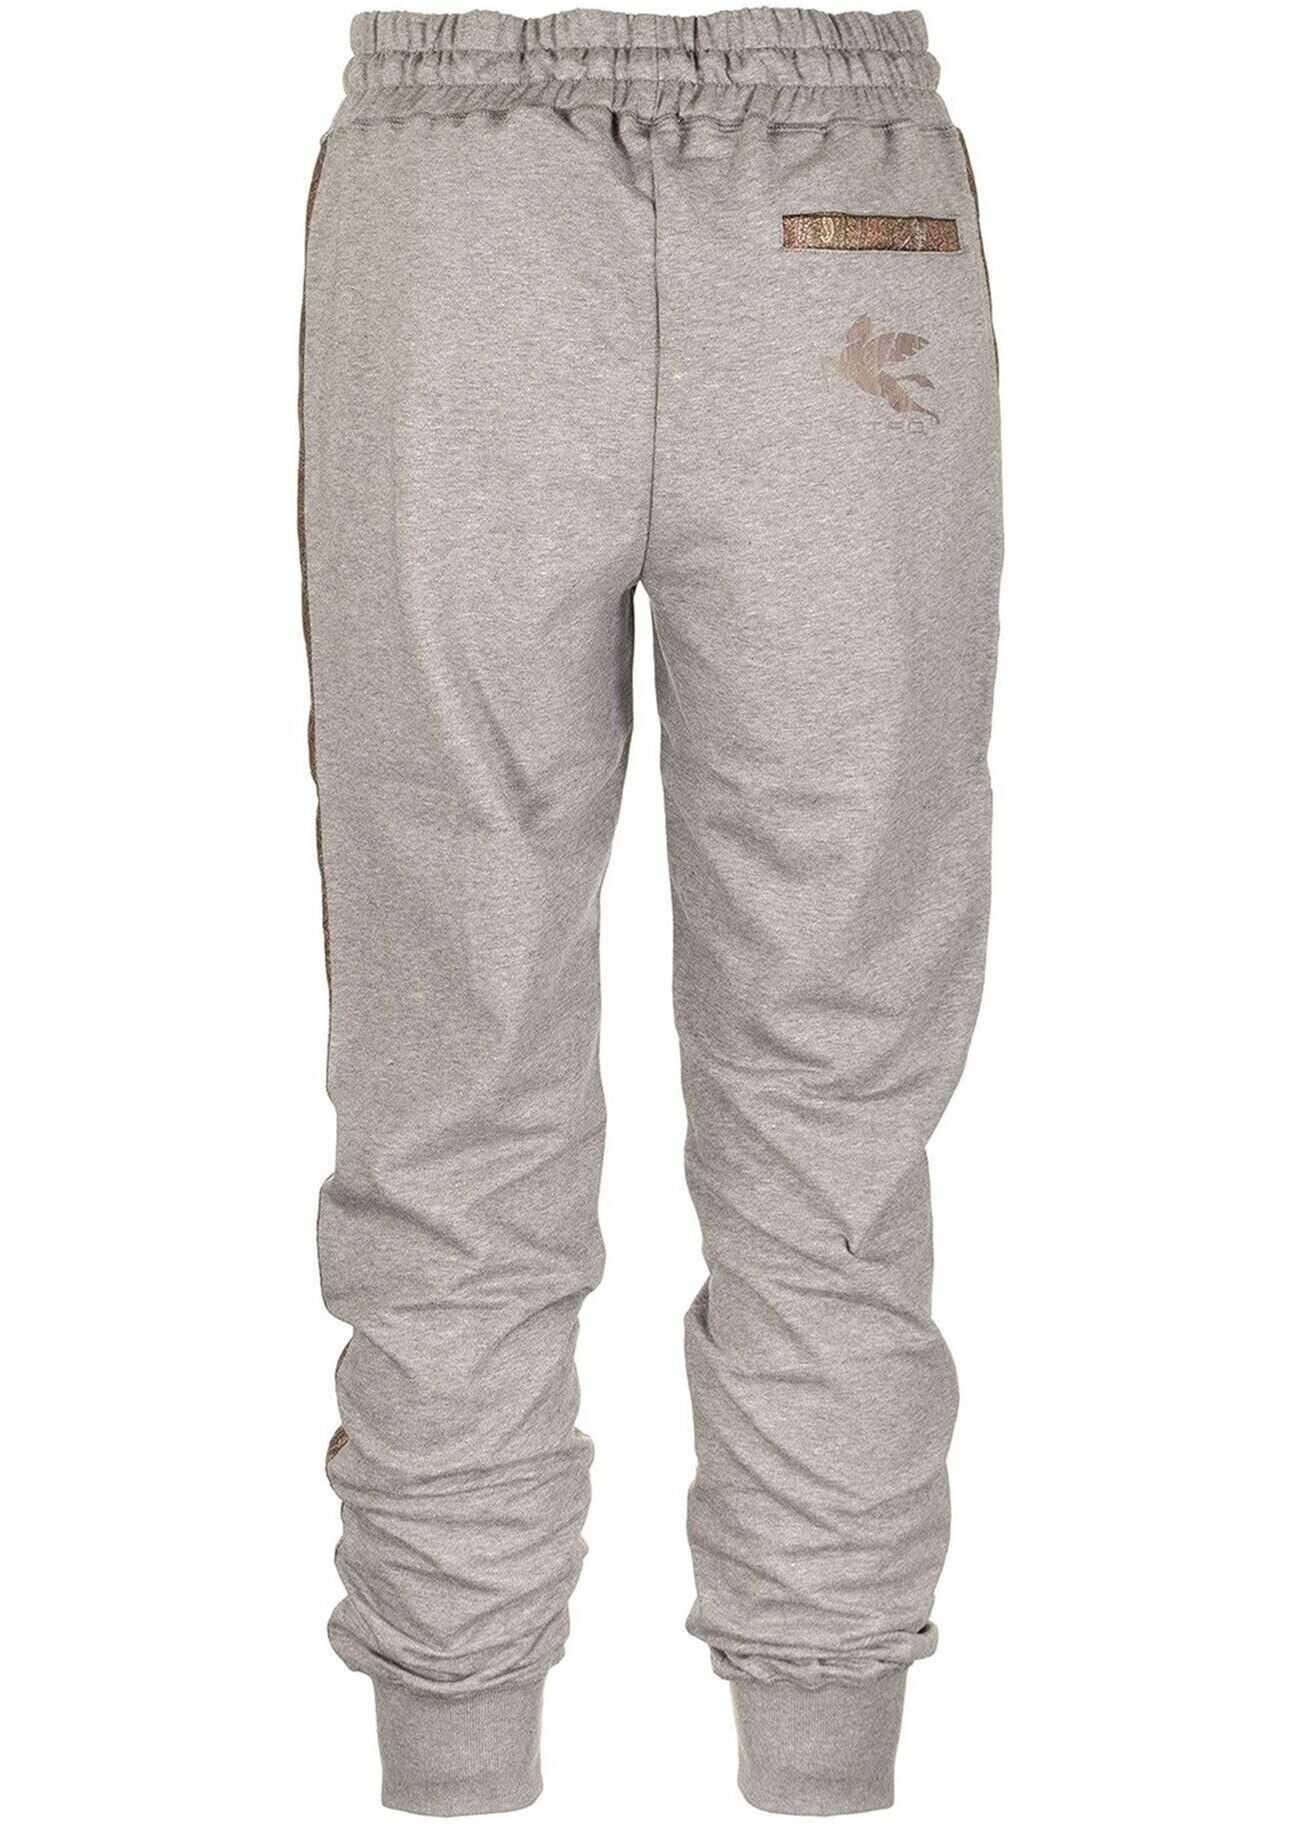 ETRO Paisley Stripe Jogging Trousers Grey imagine